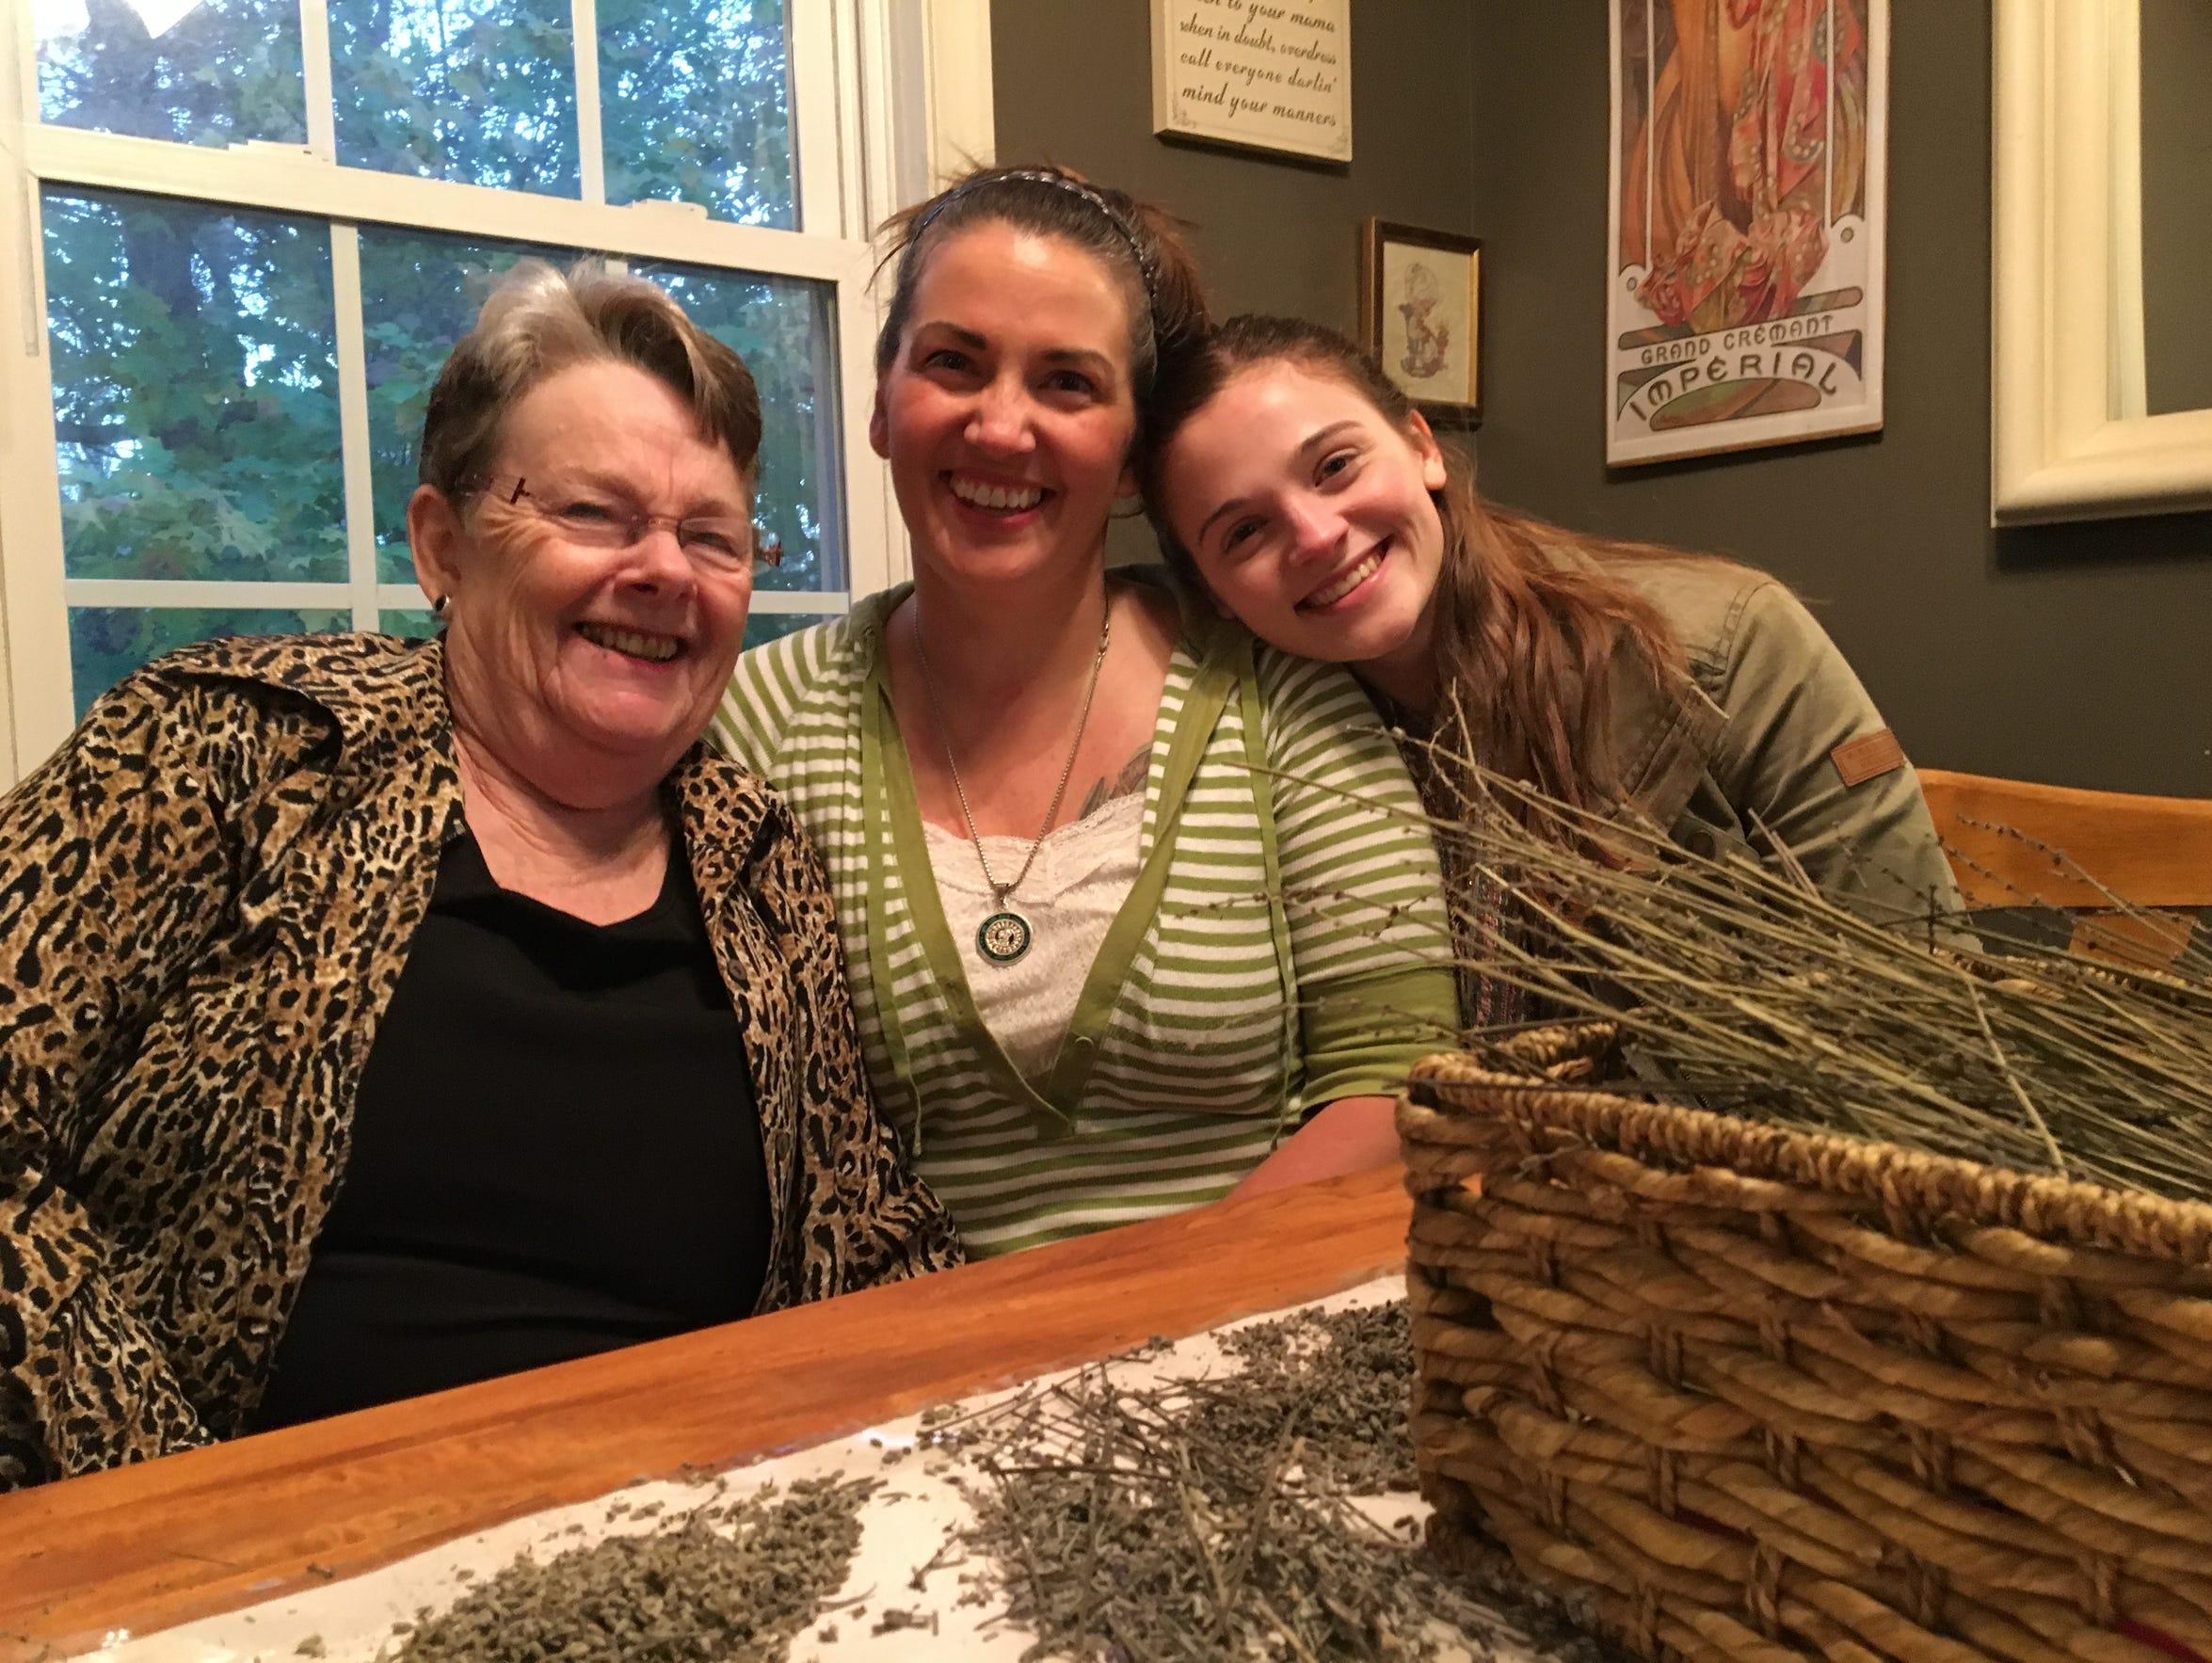 In her Staunton home on Thursday, Oct. 26, 2017, Nikki